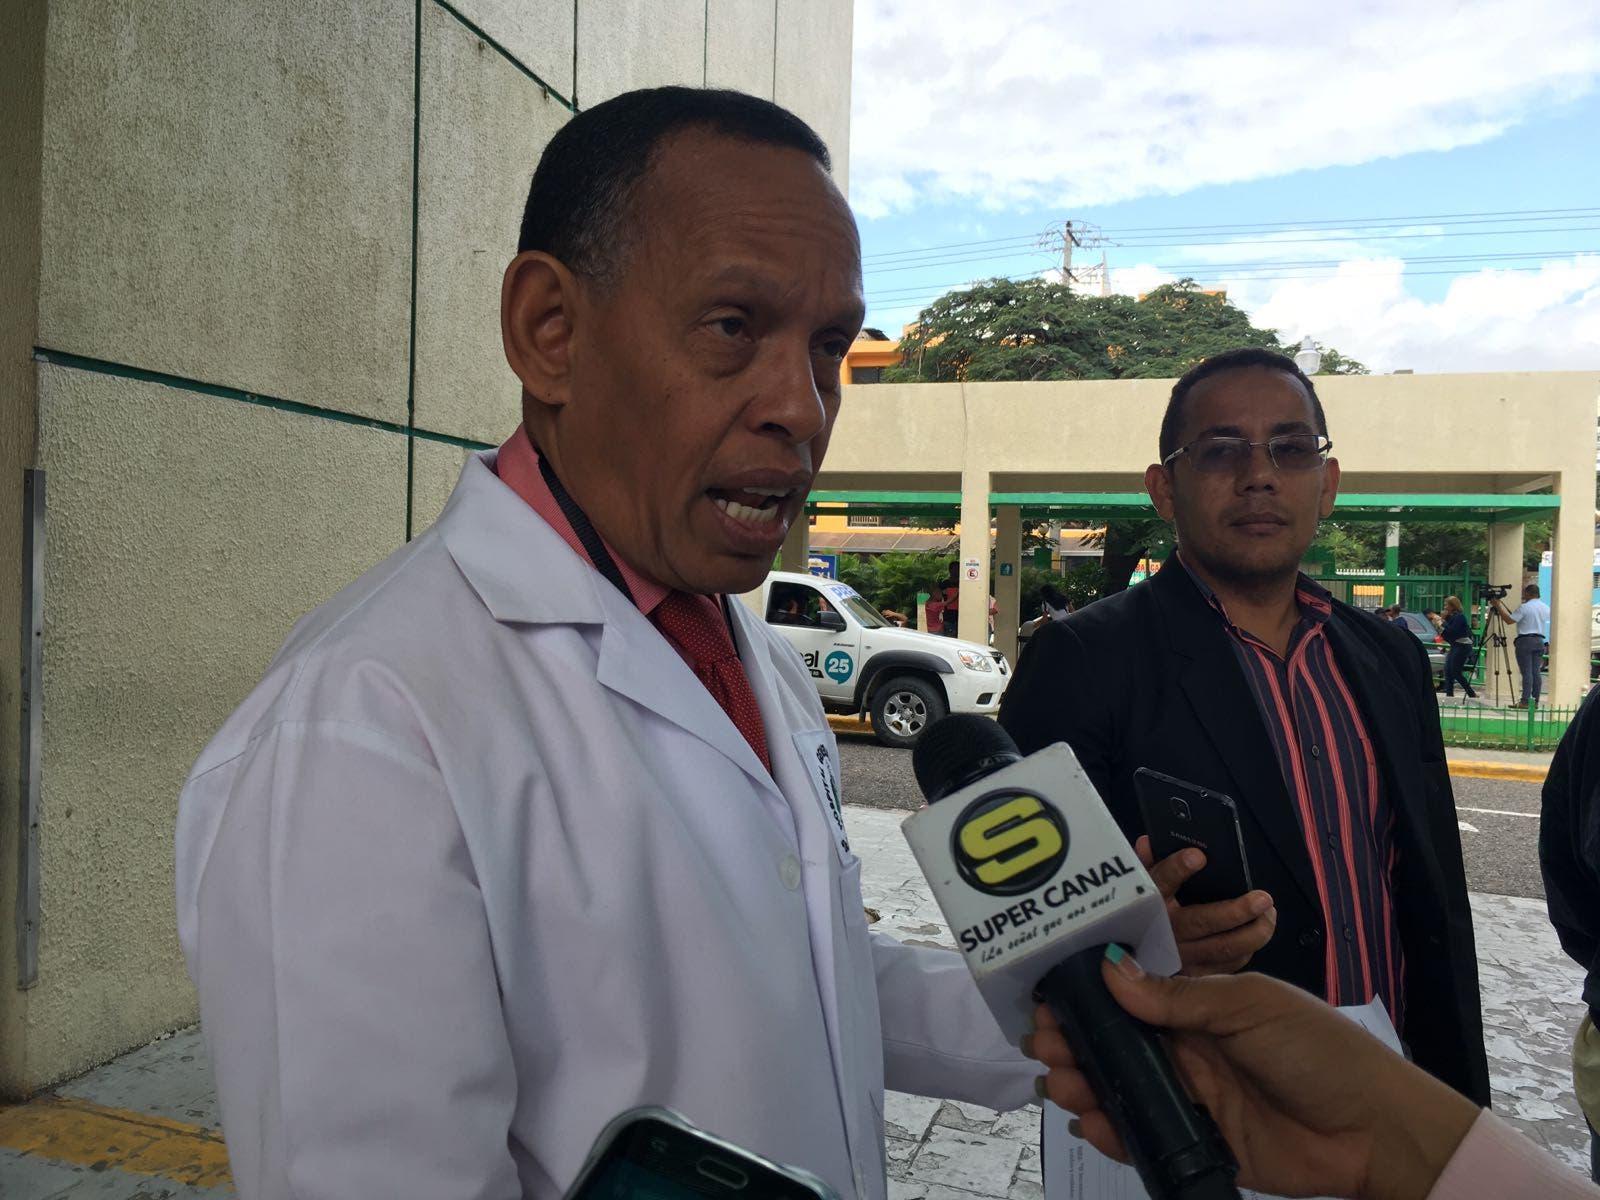 Doctor Frank Soto